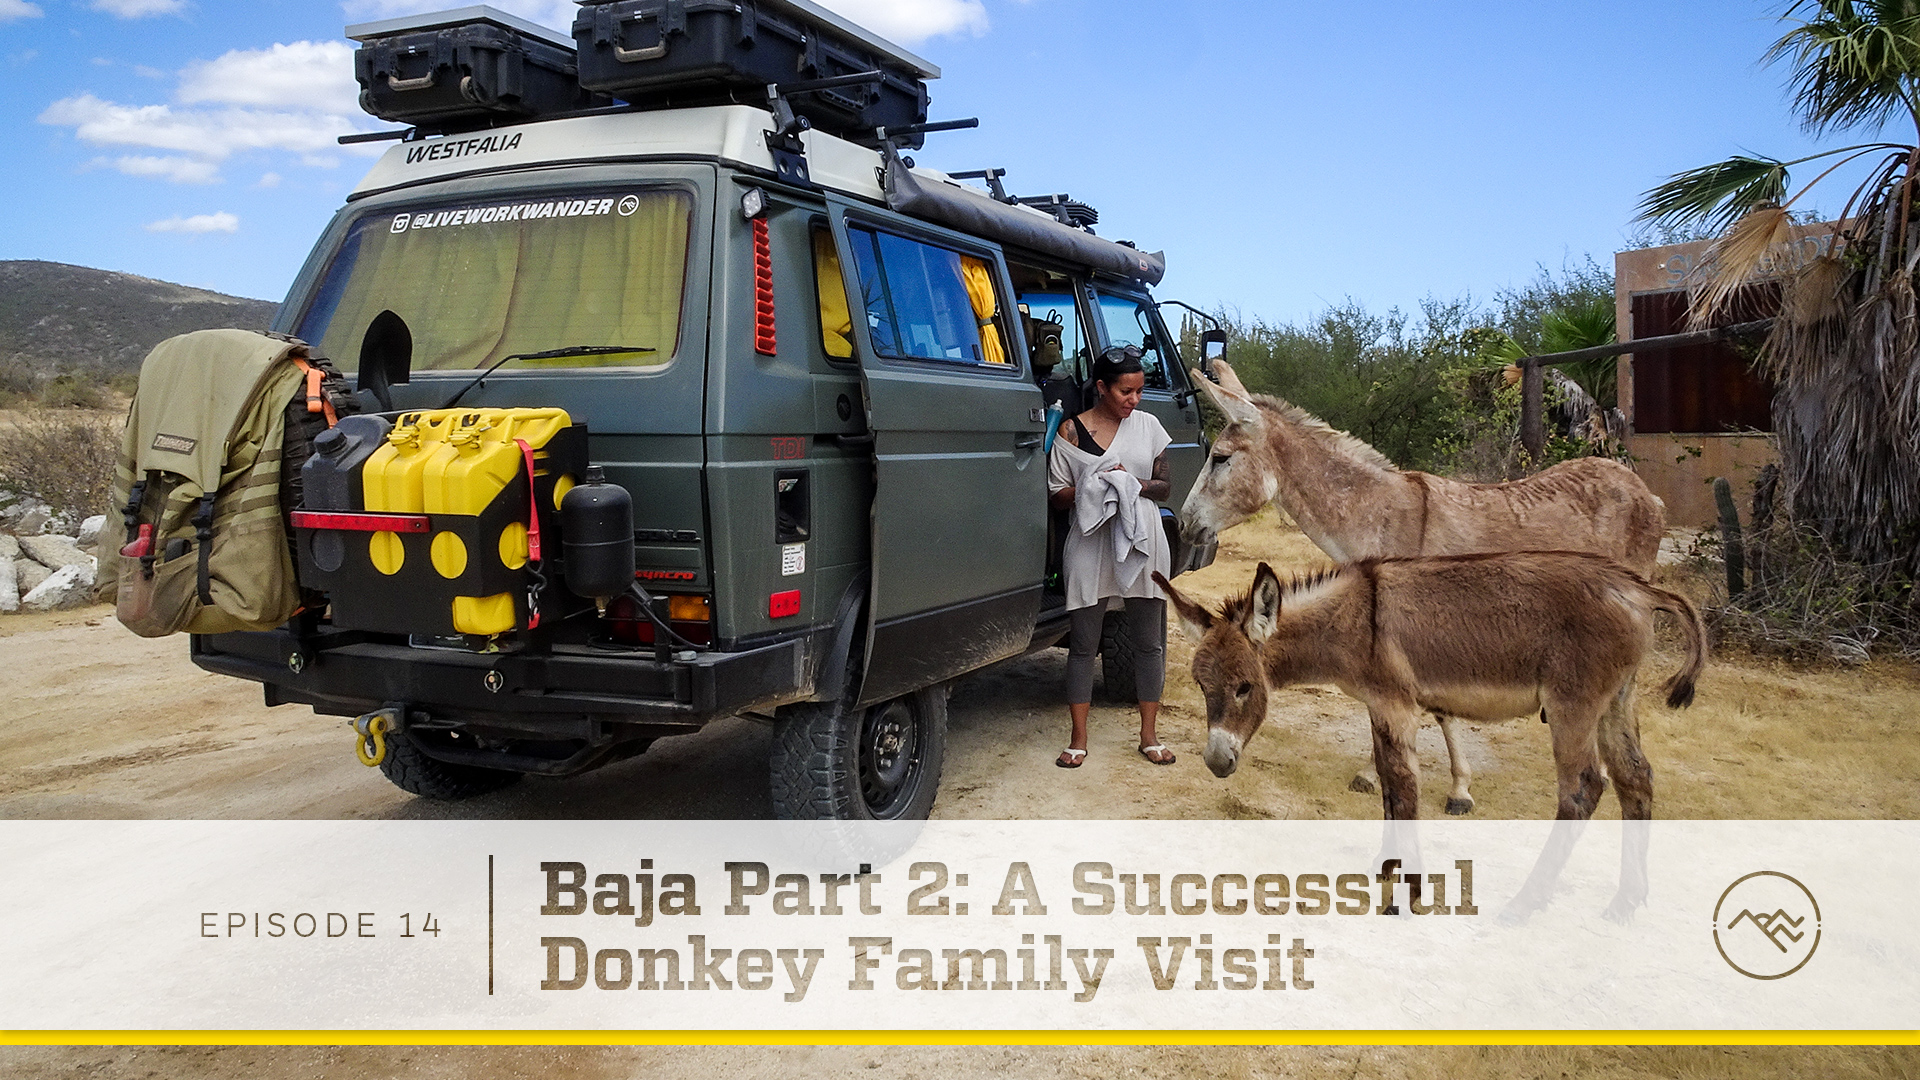 E014 : Baja Part 2 - A Successful Donkey Family Visit